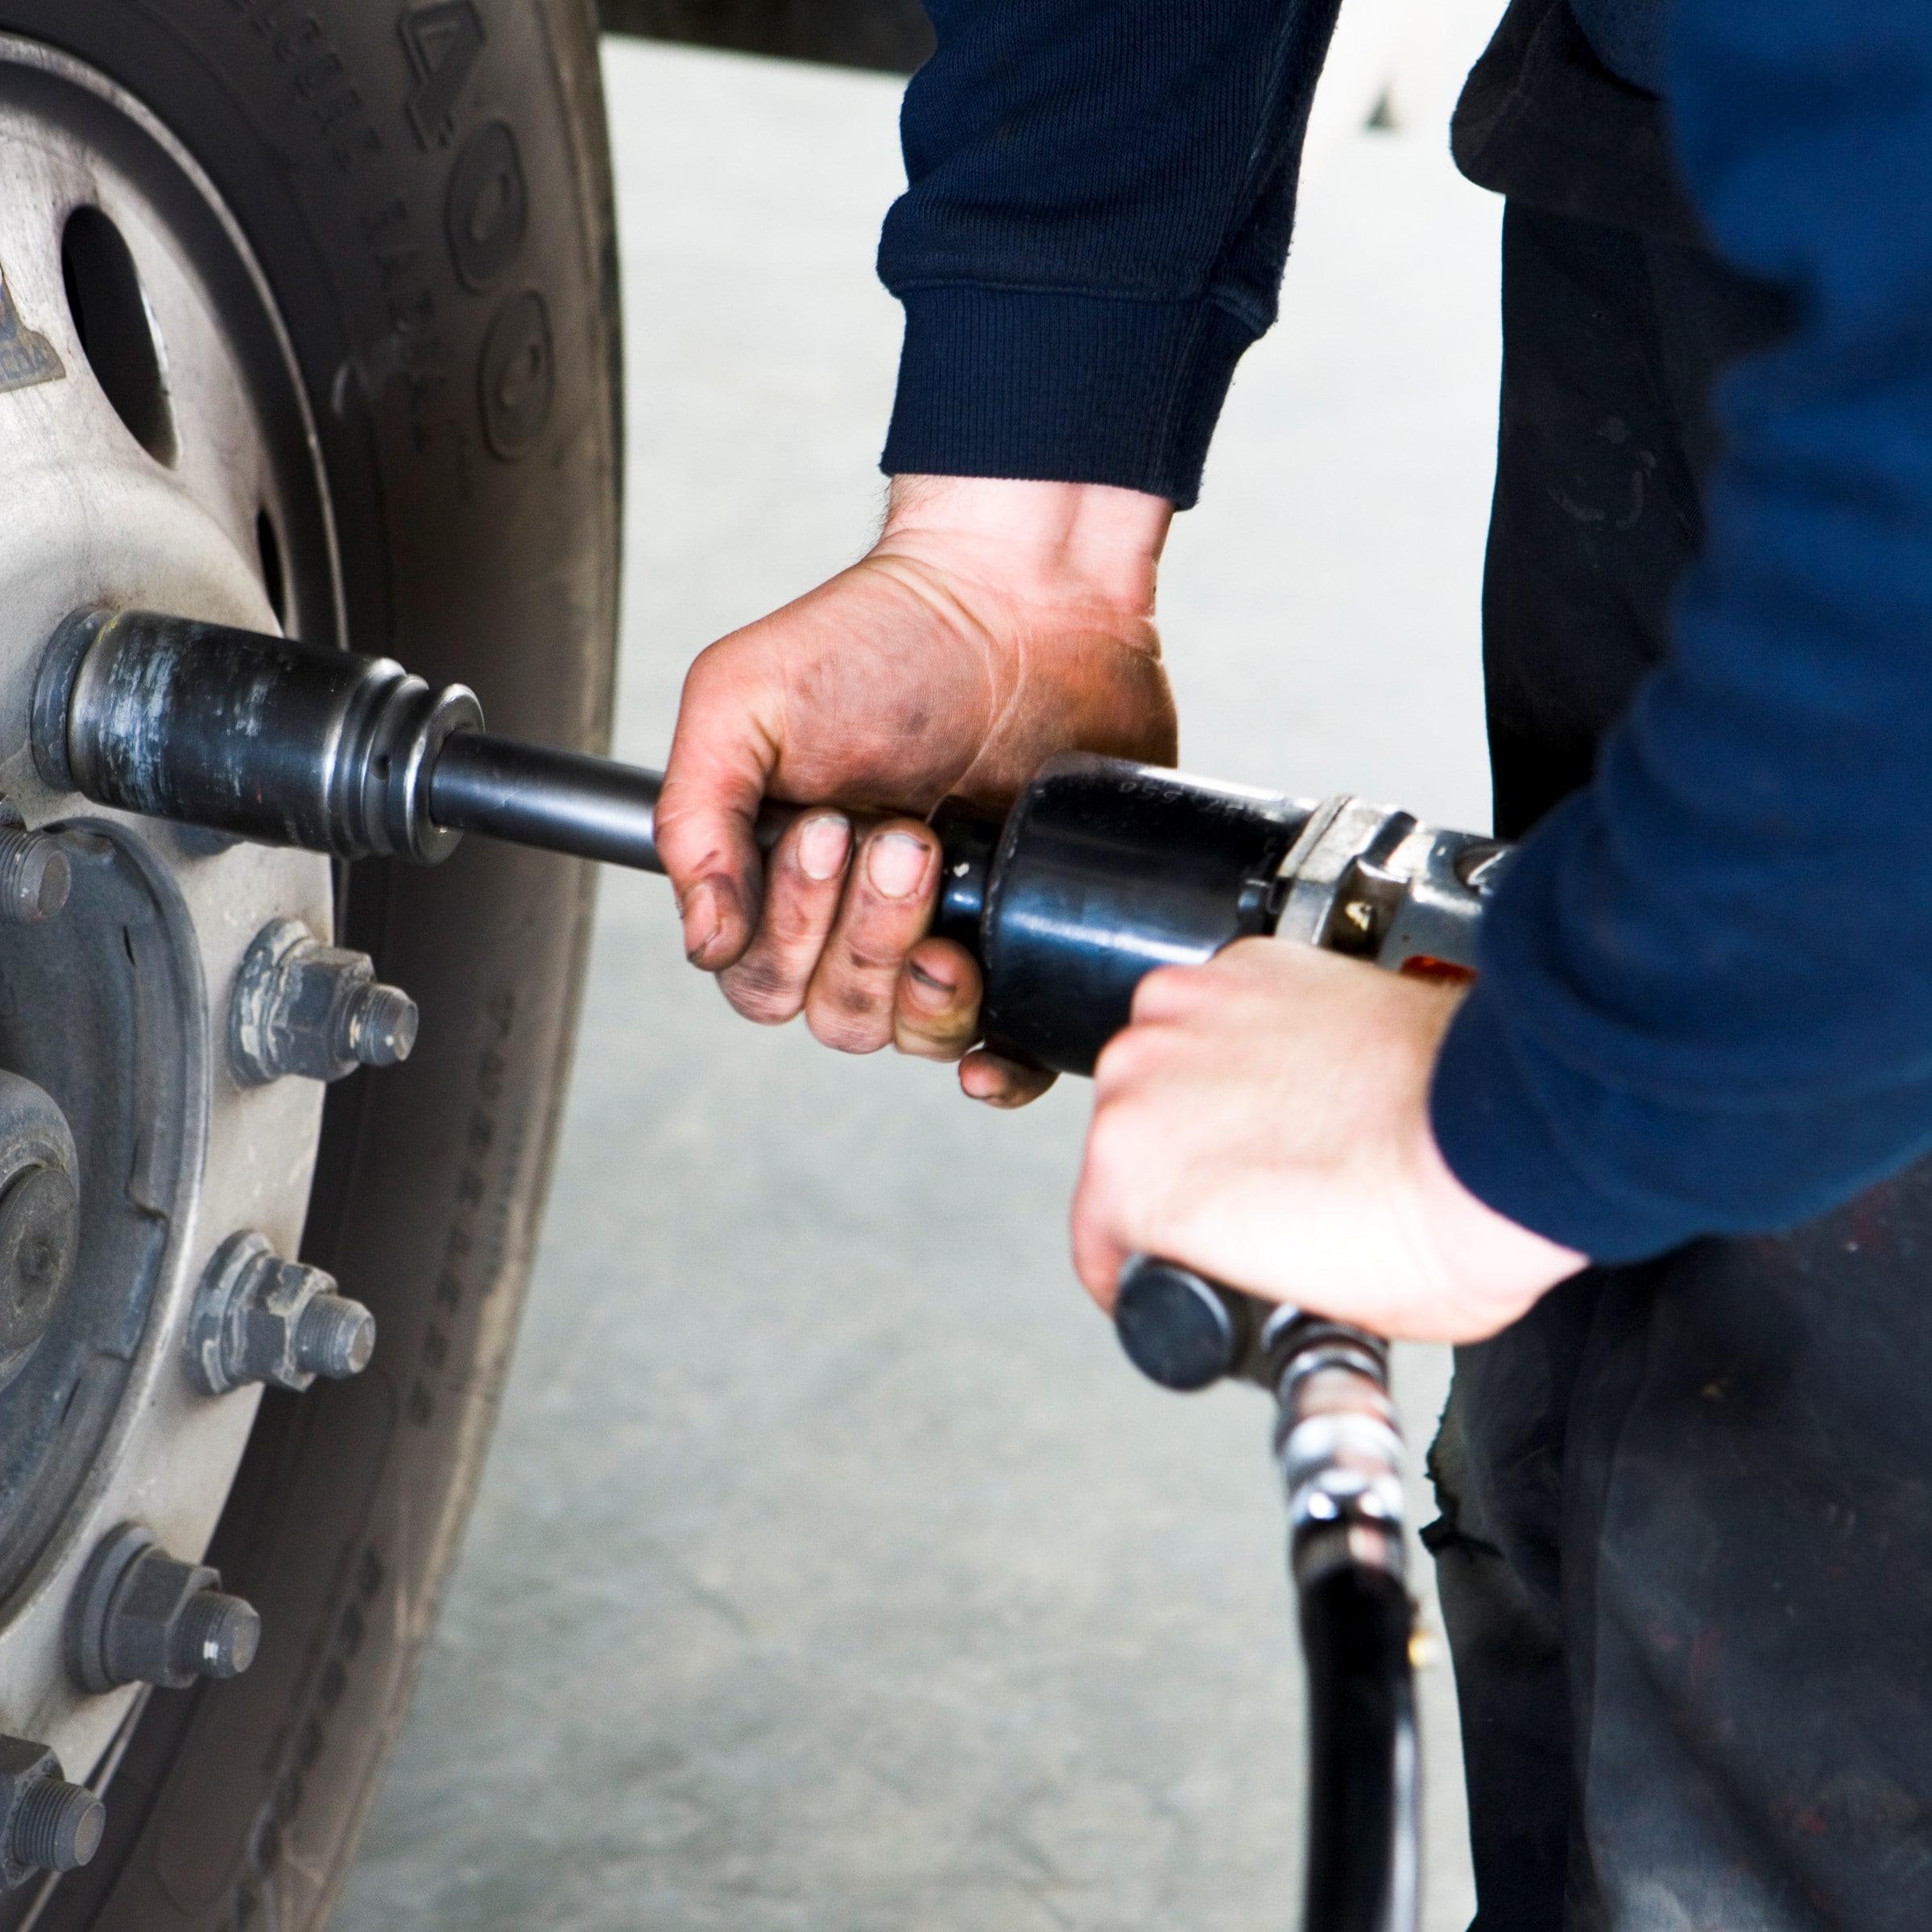 Bridgestone Select Tyres 1b 70 Hallam Rd Hampton Park 3976 Fuel Filter Pic 4